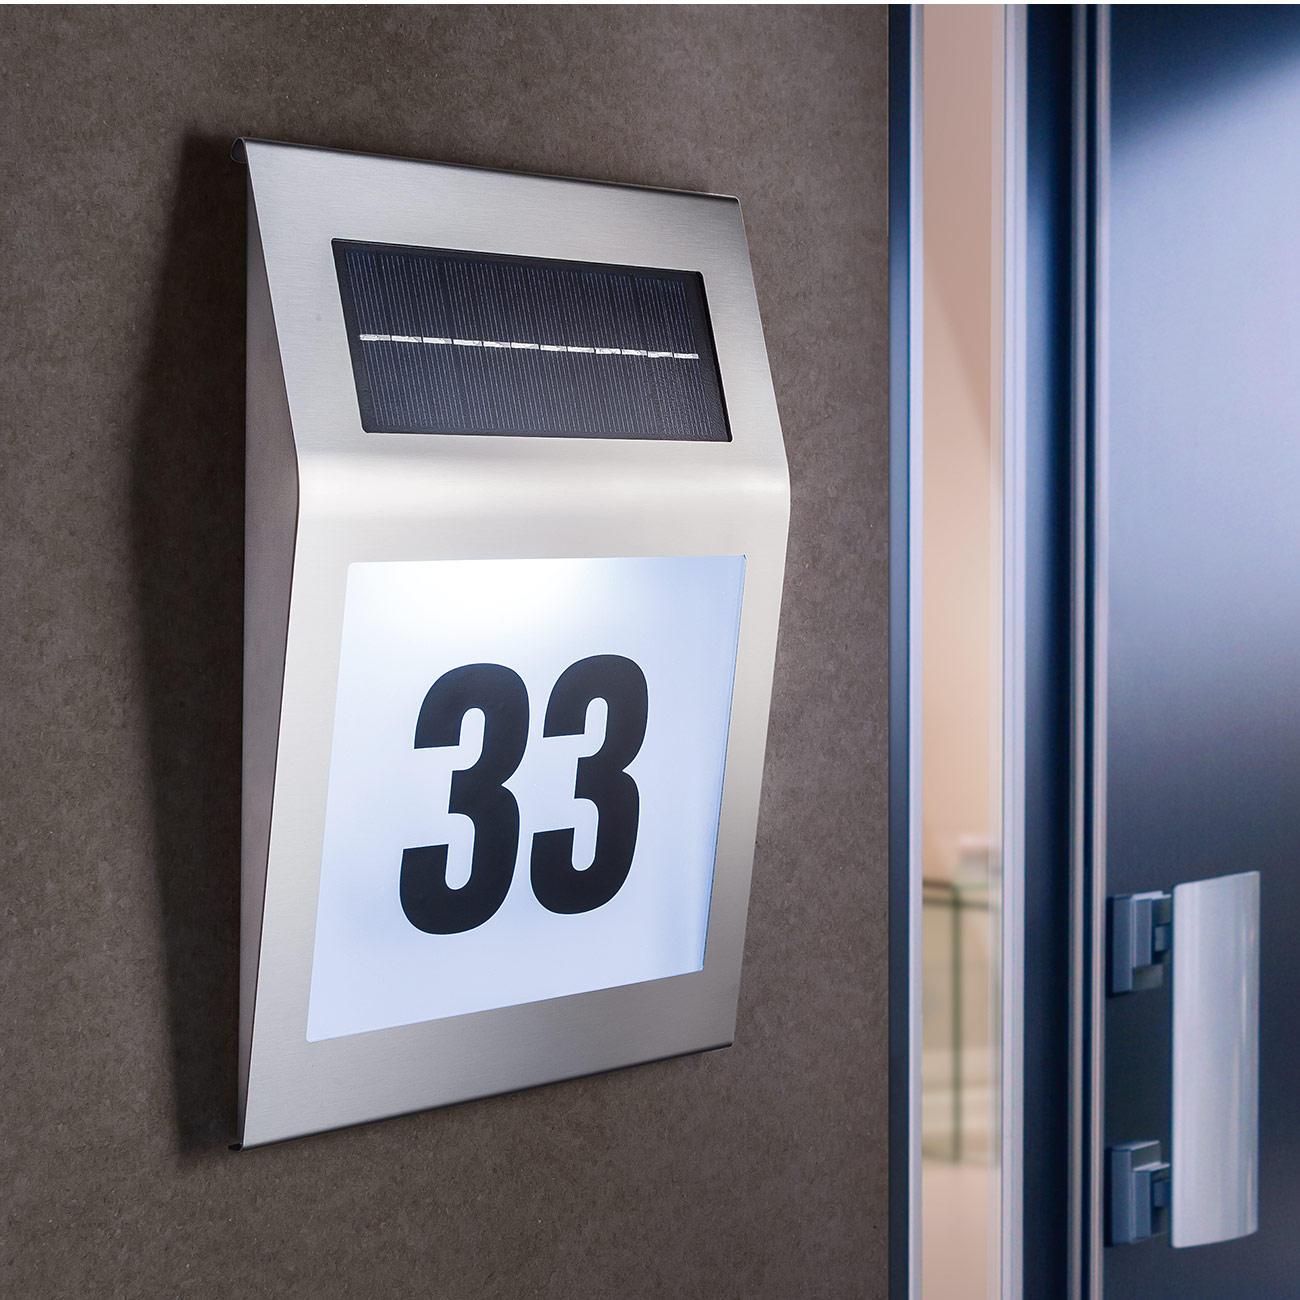 hausnummernleuchte led solar hausnummern leuchte gev 11014f click sehr flache hausnummern. Black Bedroom Furniture Sets. Home Design Ideas